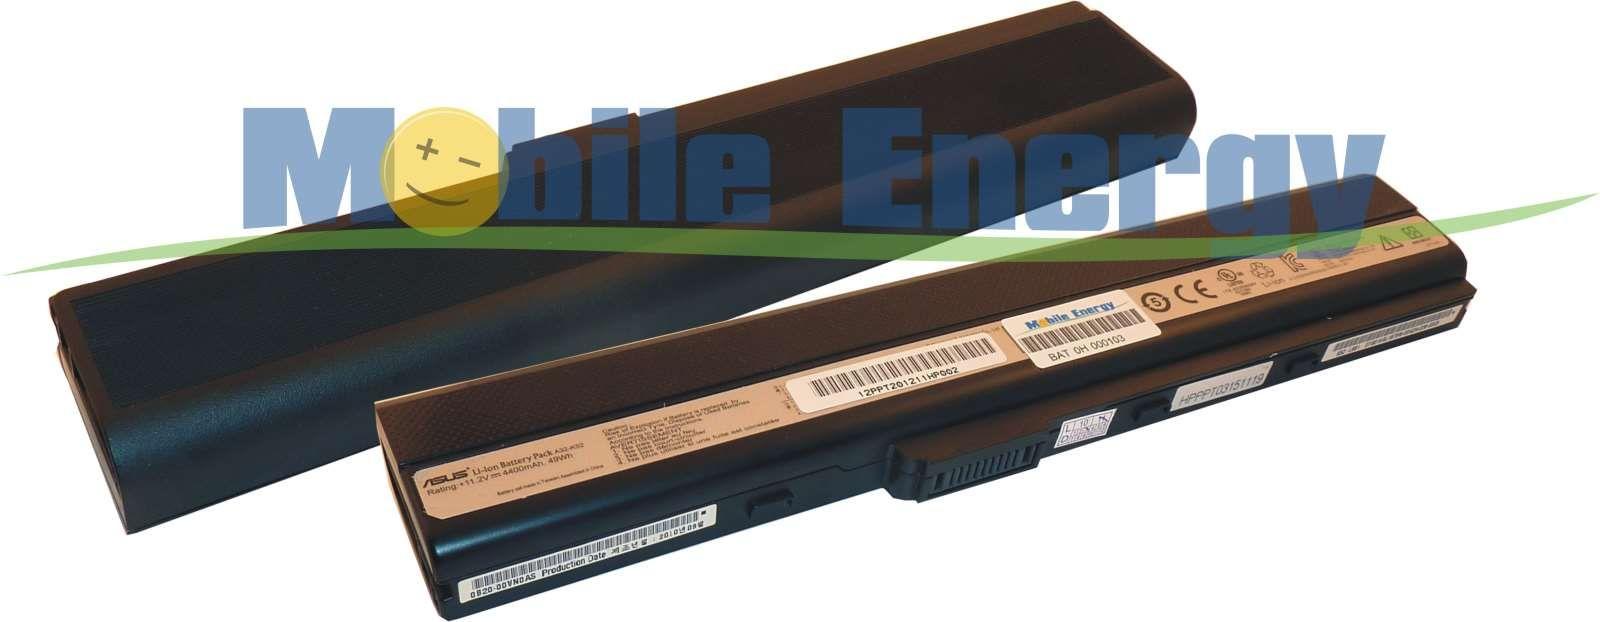 Mobile-Energy Baterie Asus K42 / K52 / K62 / N82 / P42 / P52 / P